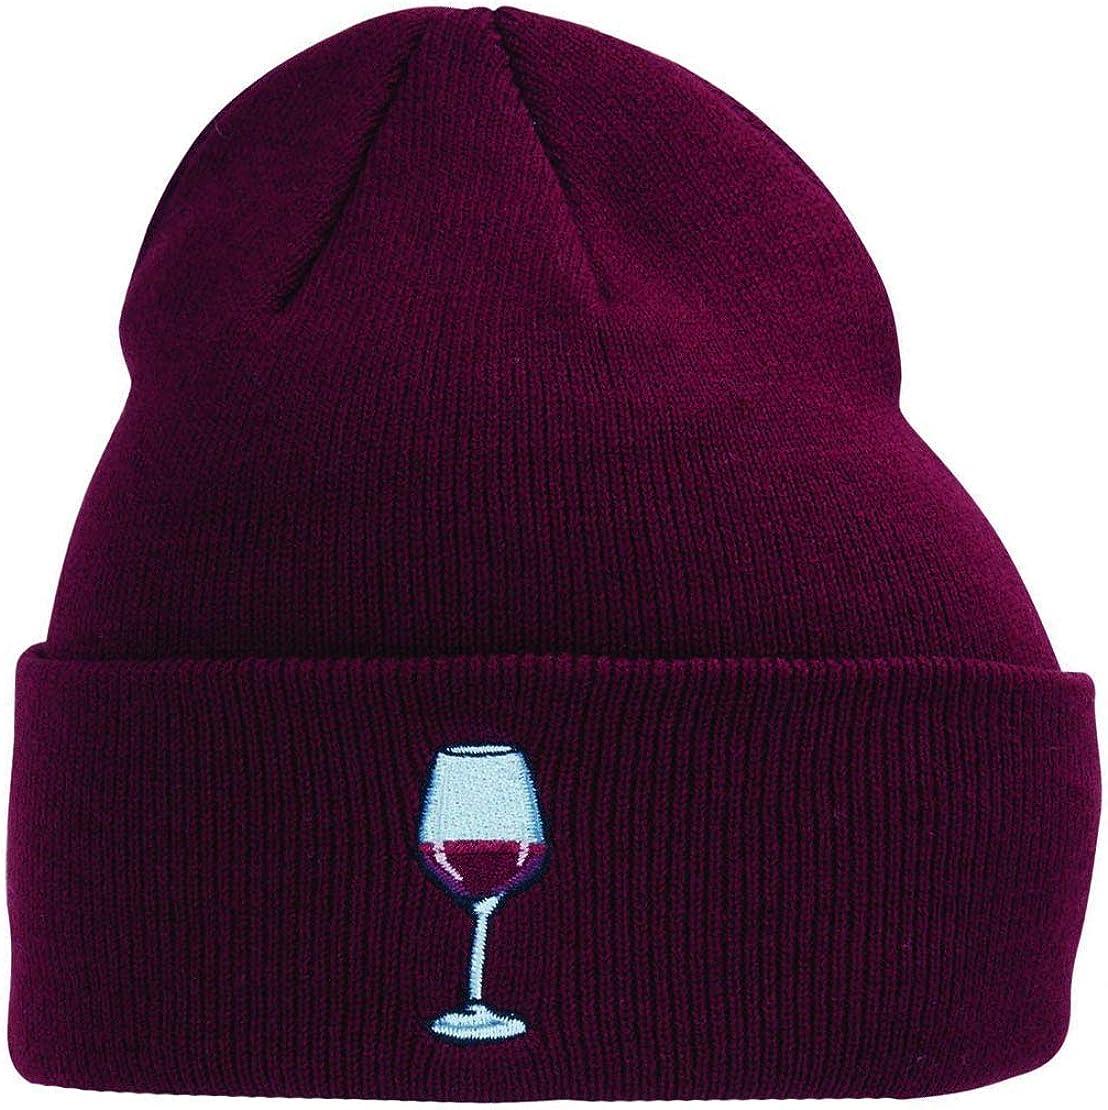 Coal Mens The Crave Fine Knit Cuffed Beanie Hat